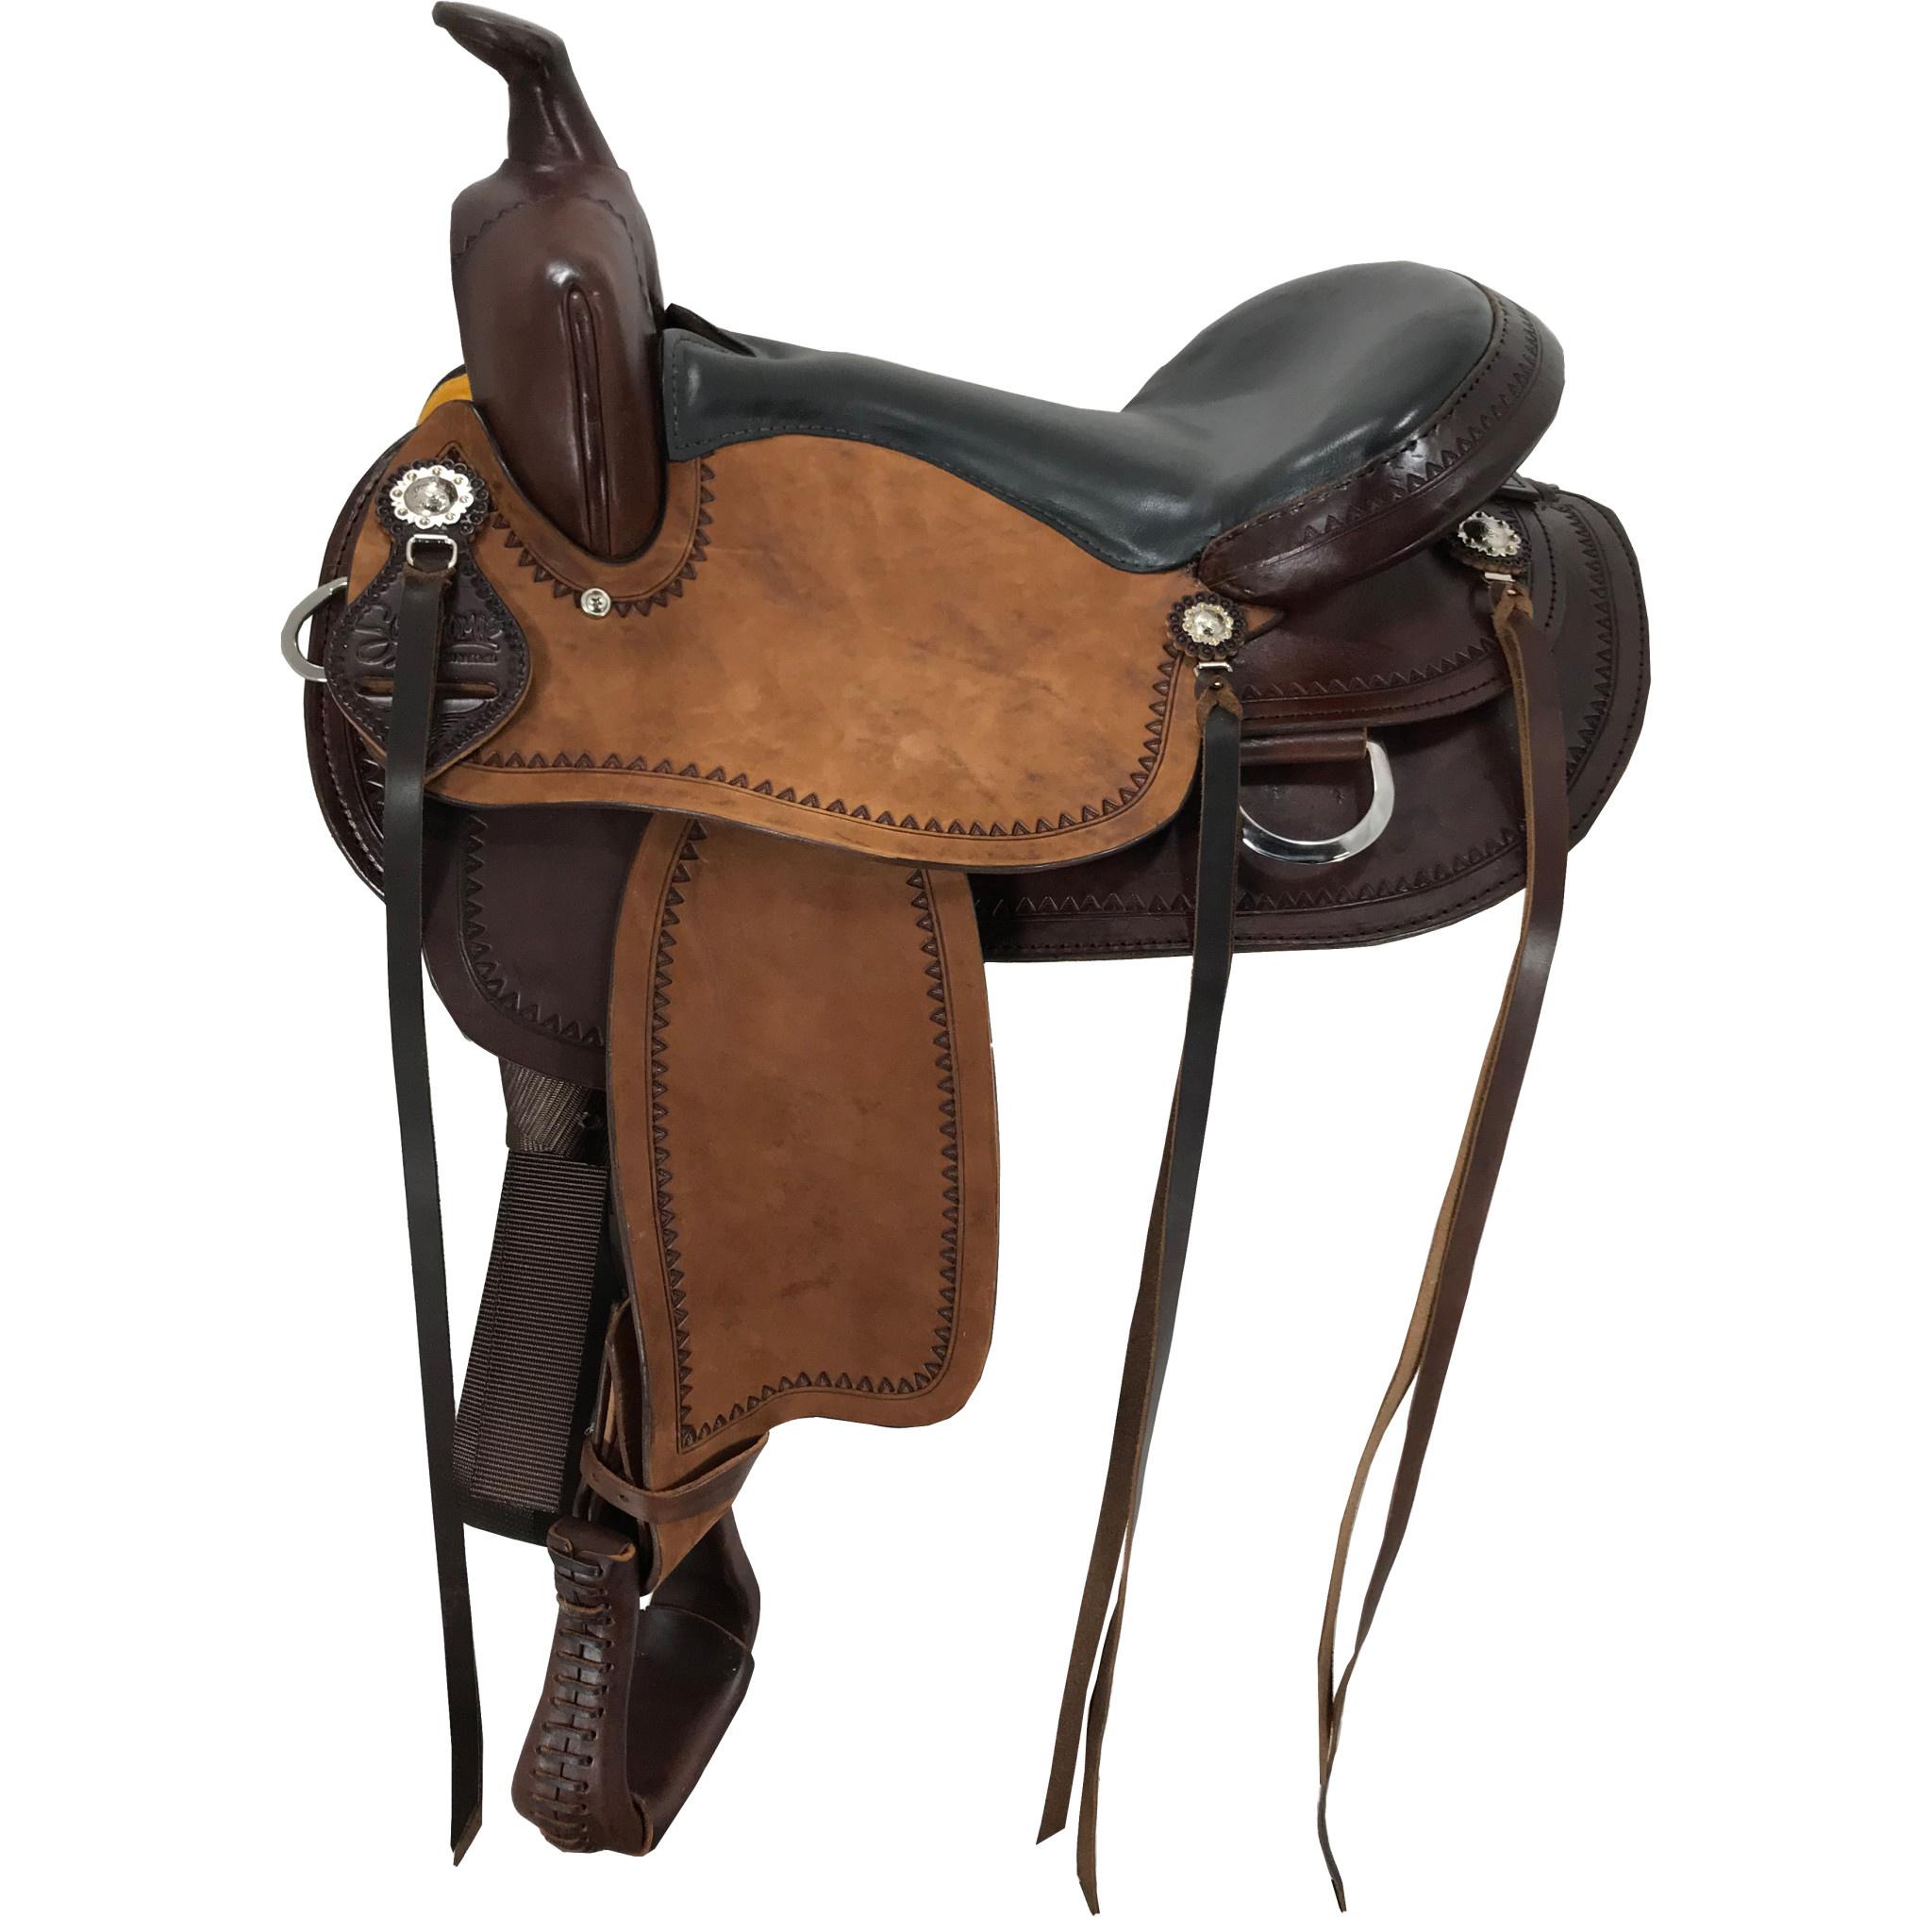 Scott Thomas Custom Saddles Larkspur Trail Rough Out